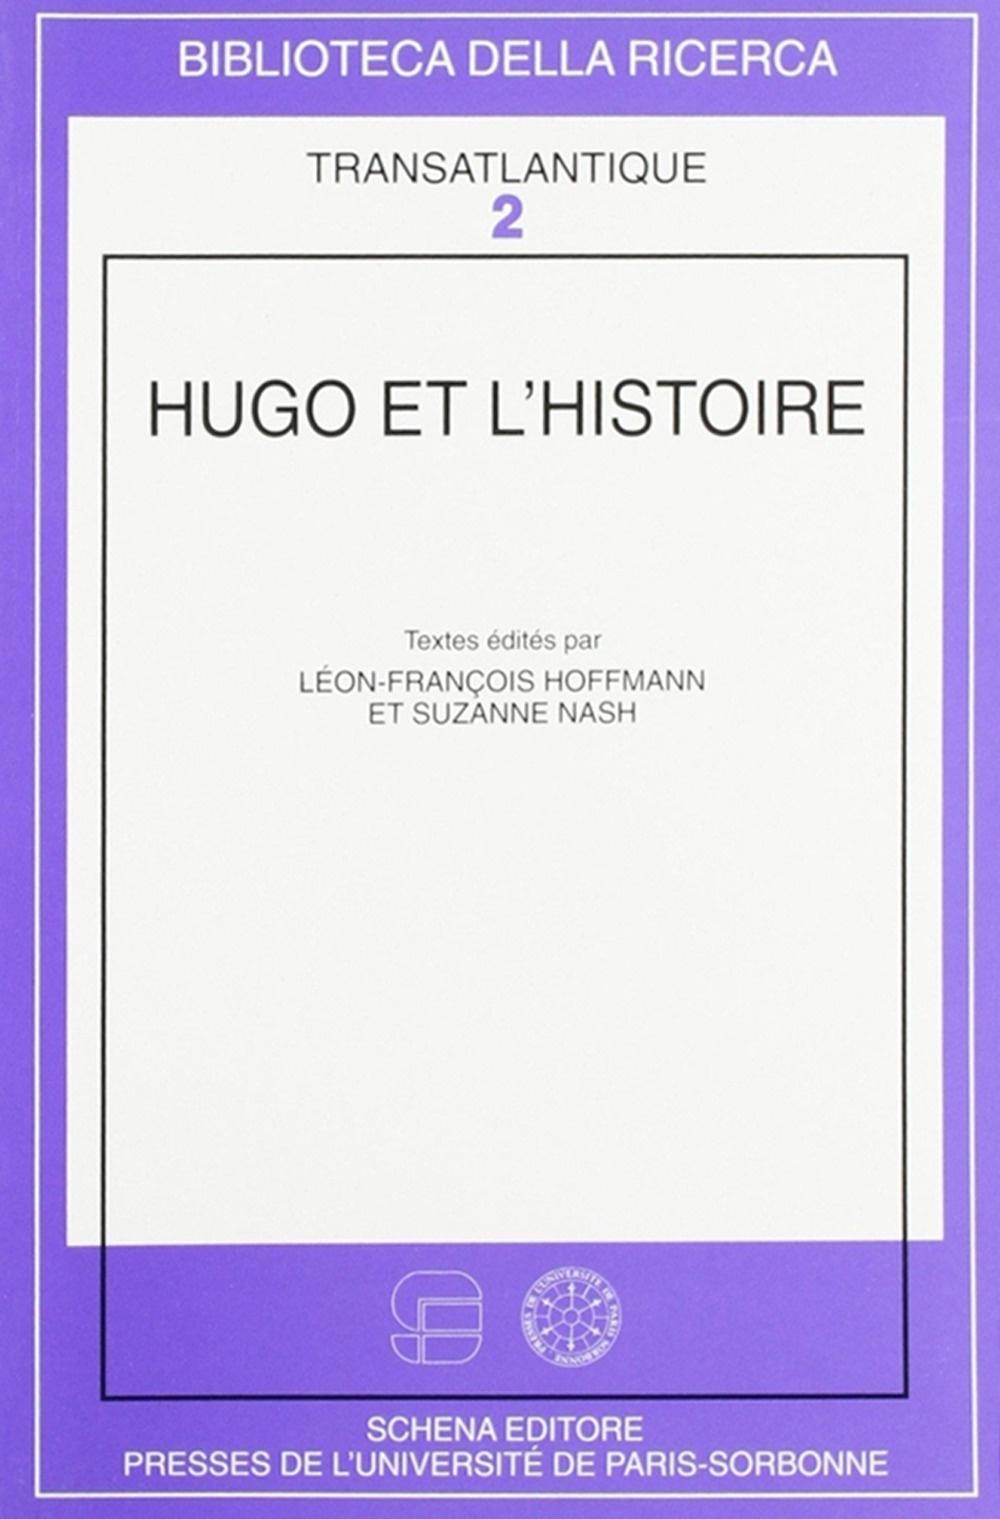 Hugo et l'histoire